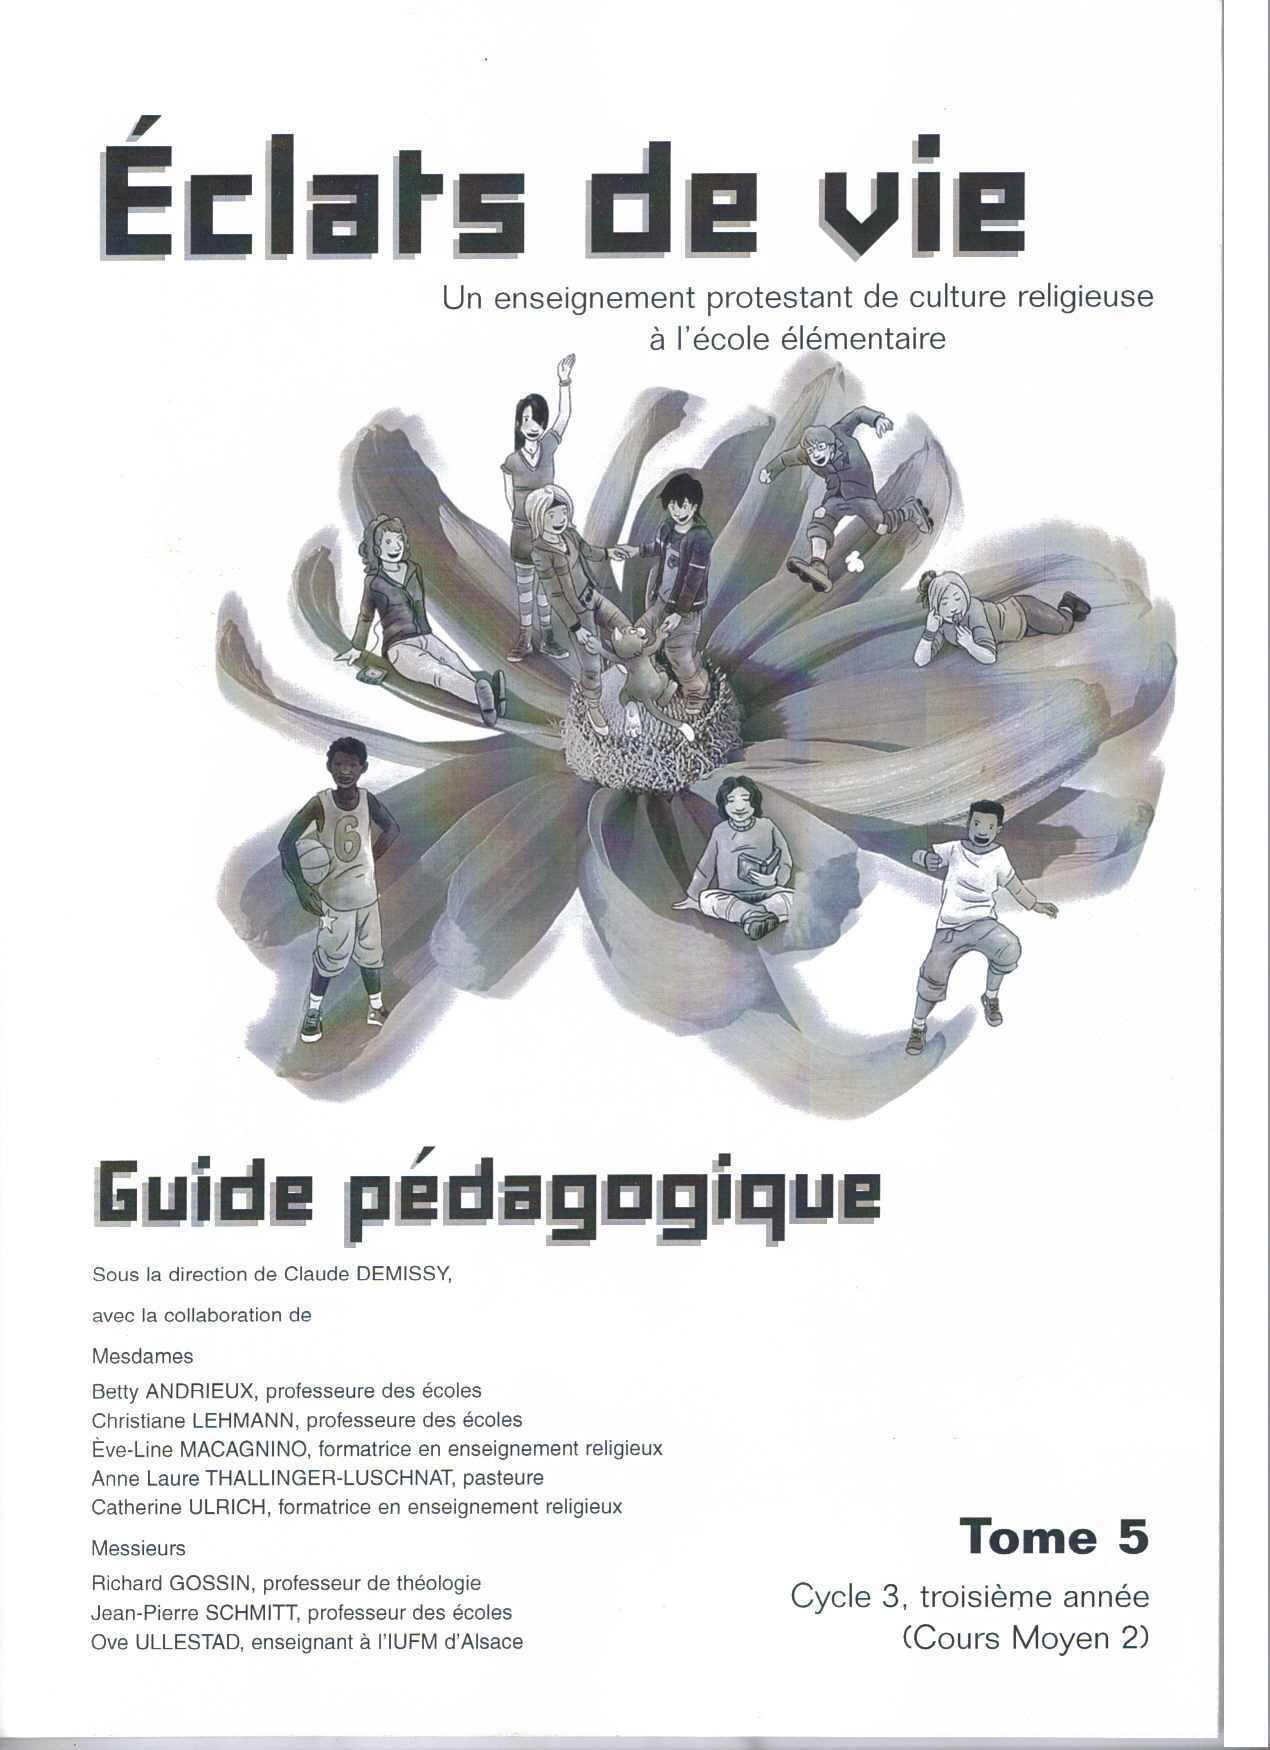 ECLATS DE VIE TOME 1 - GUIDE PEDAGOGIQUE